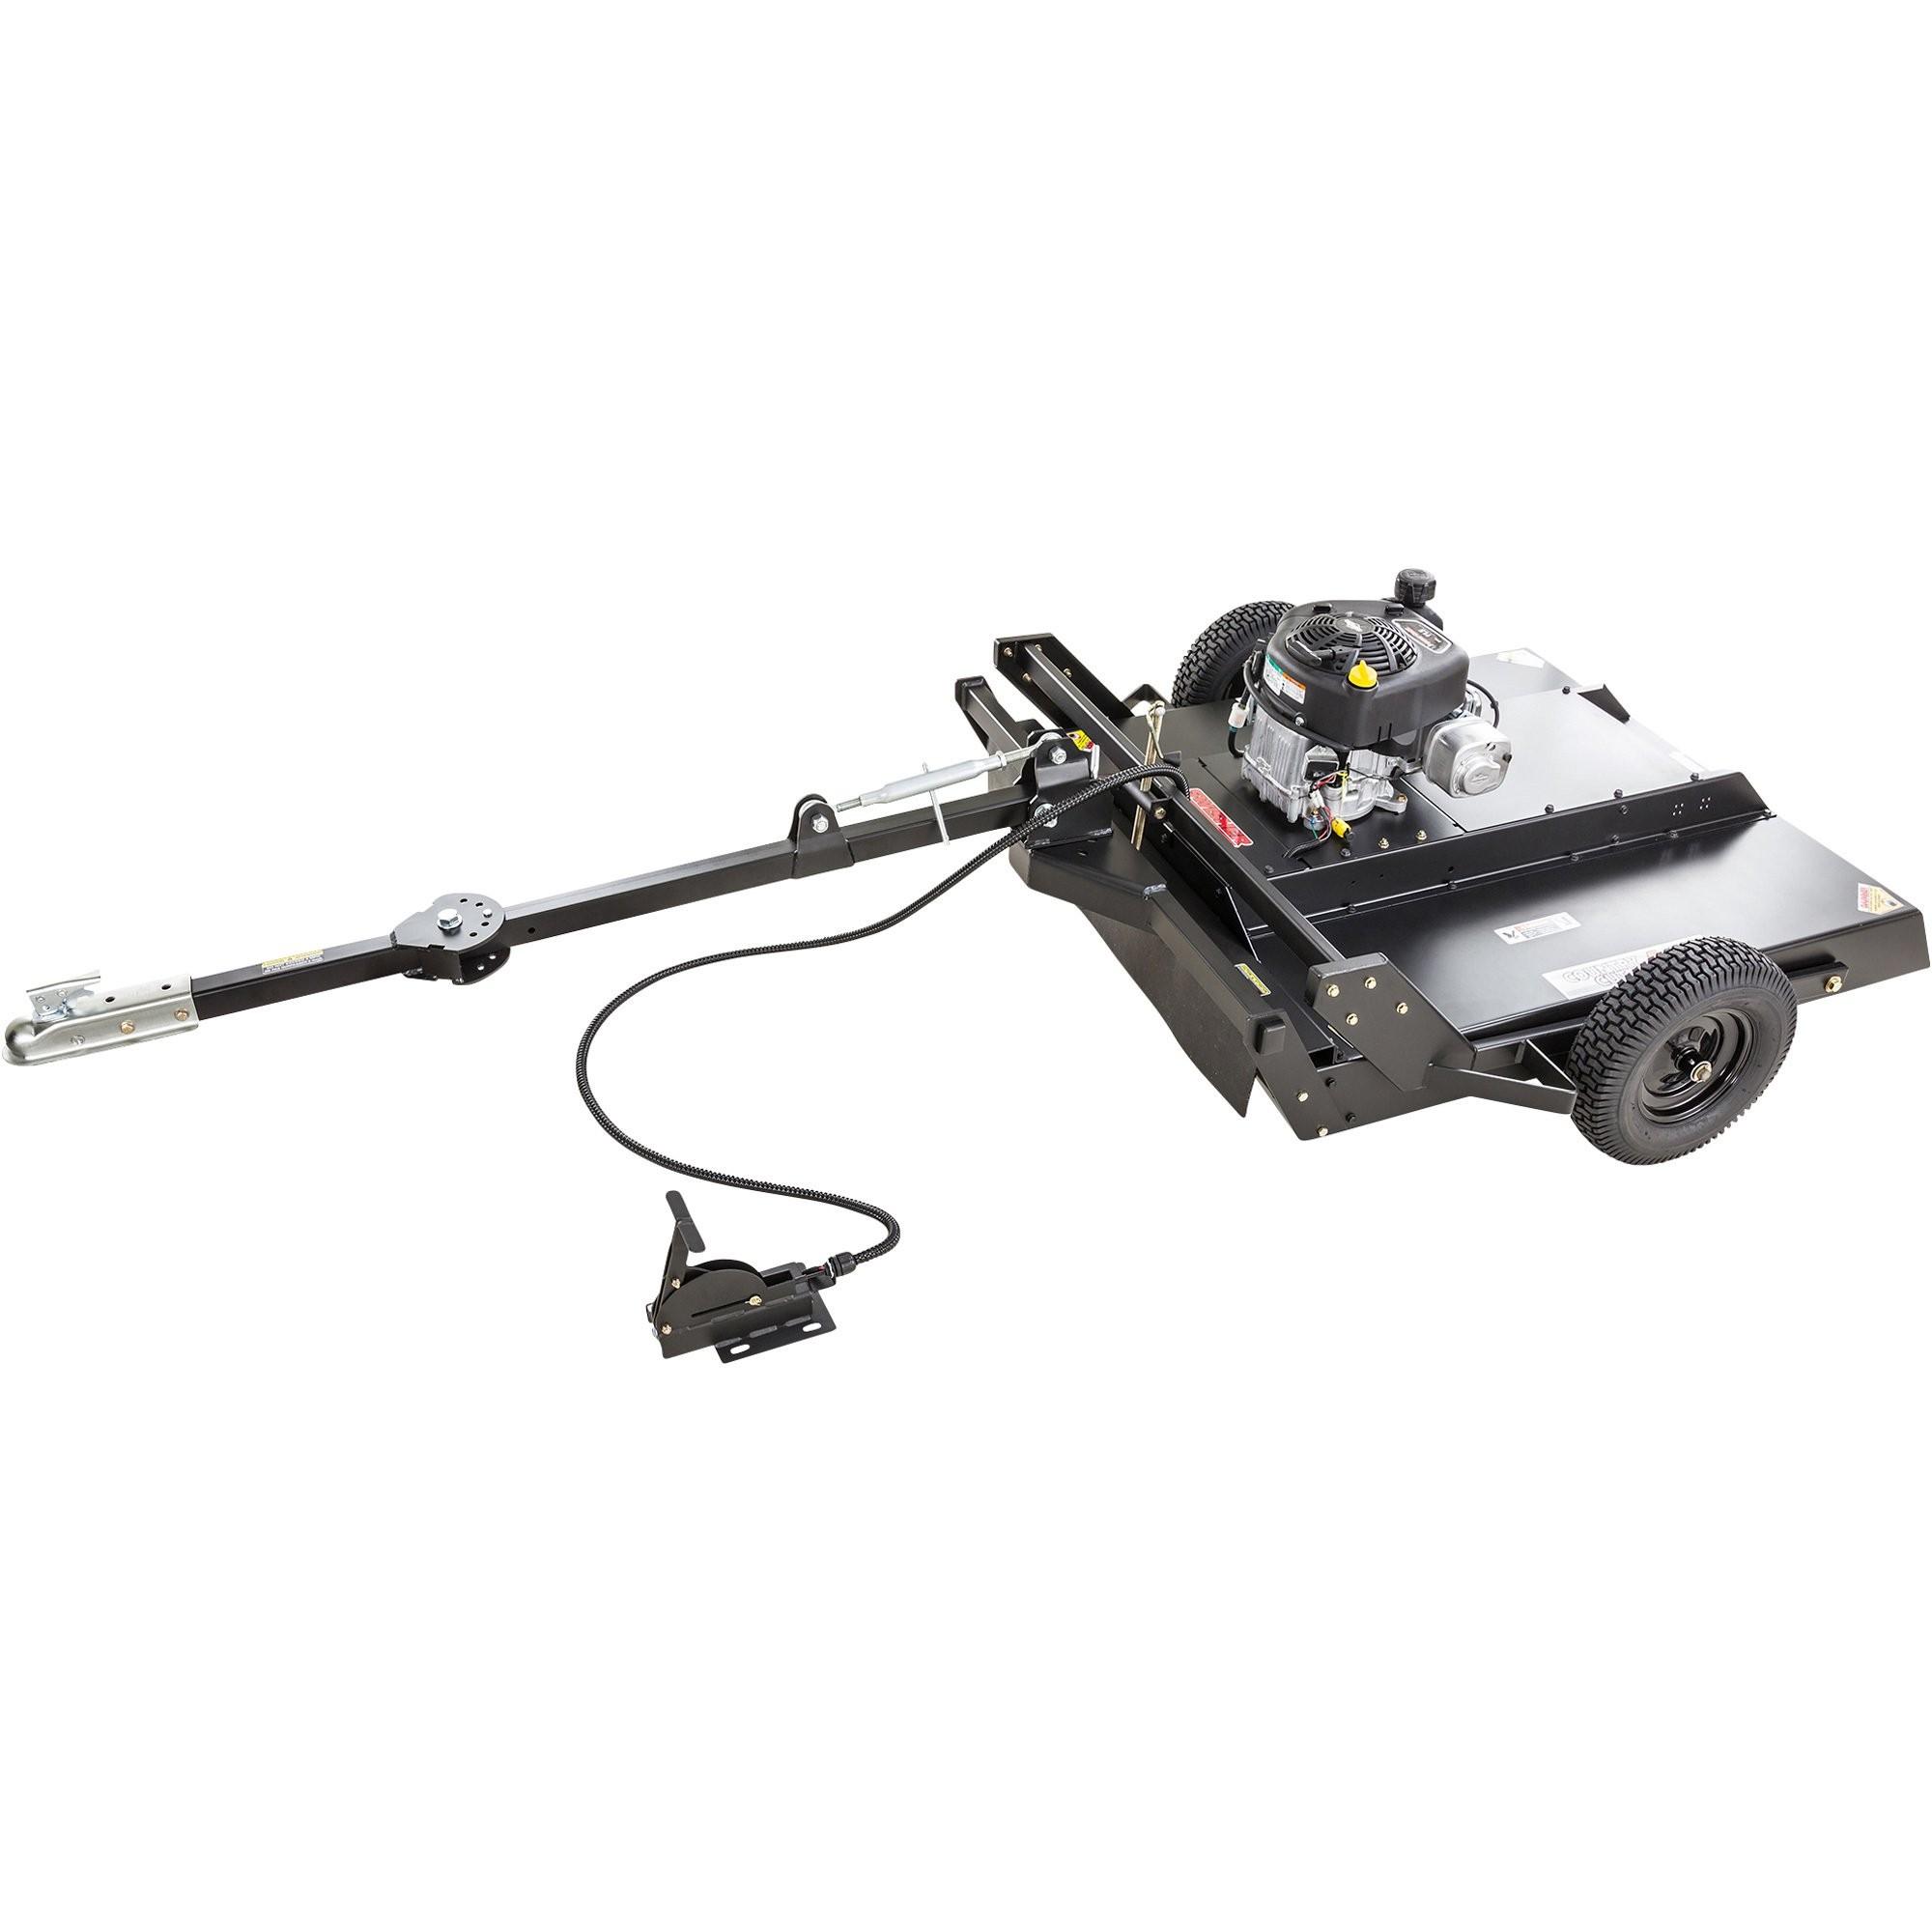 Diagram Of A Lawn Mower Engine Swisher Rough Cut Pull Behind Mower — 344cc Briggs & Stratton Of Diagram Of A Lawn Mower Engine